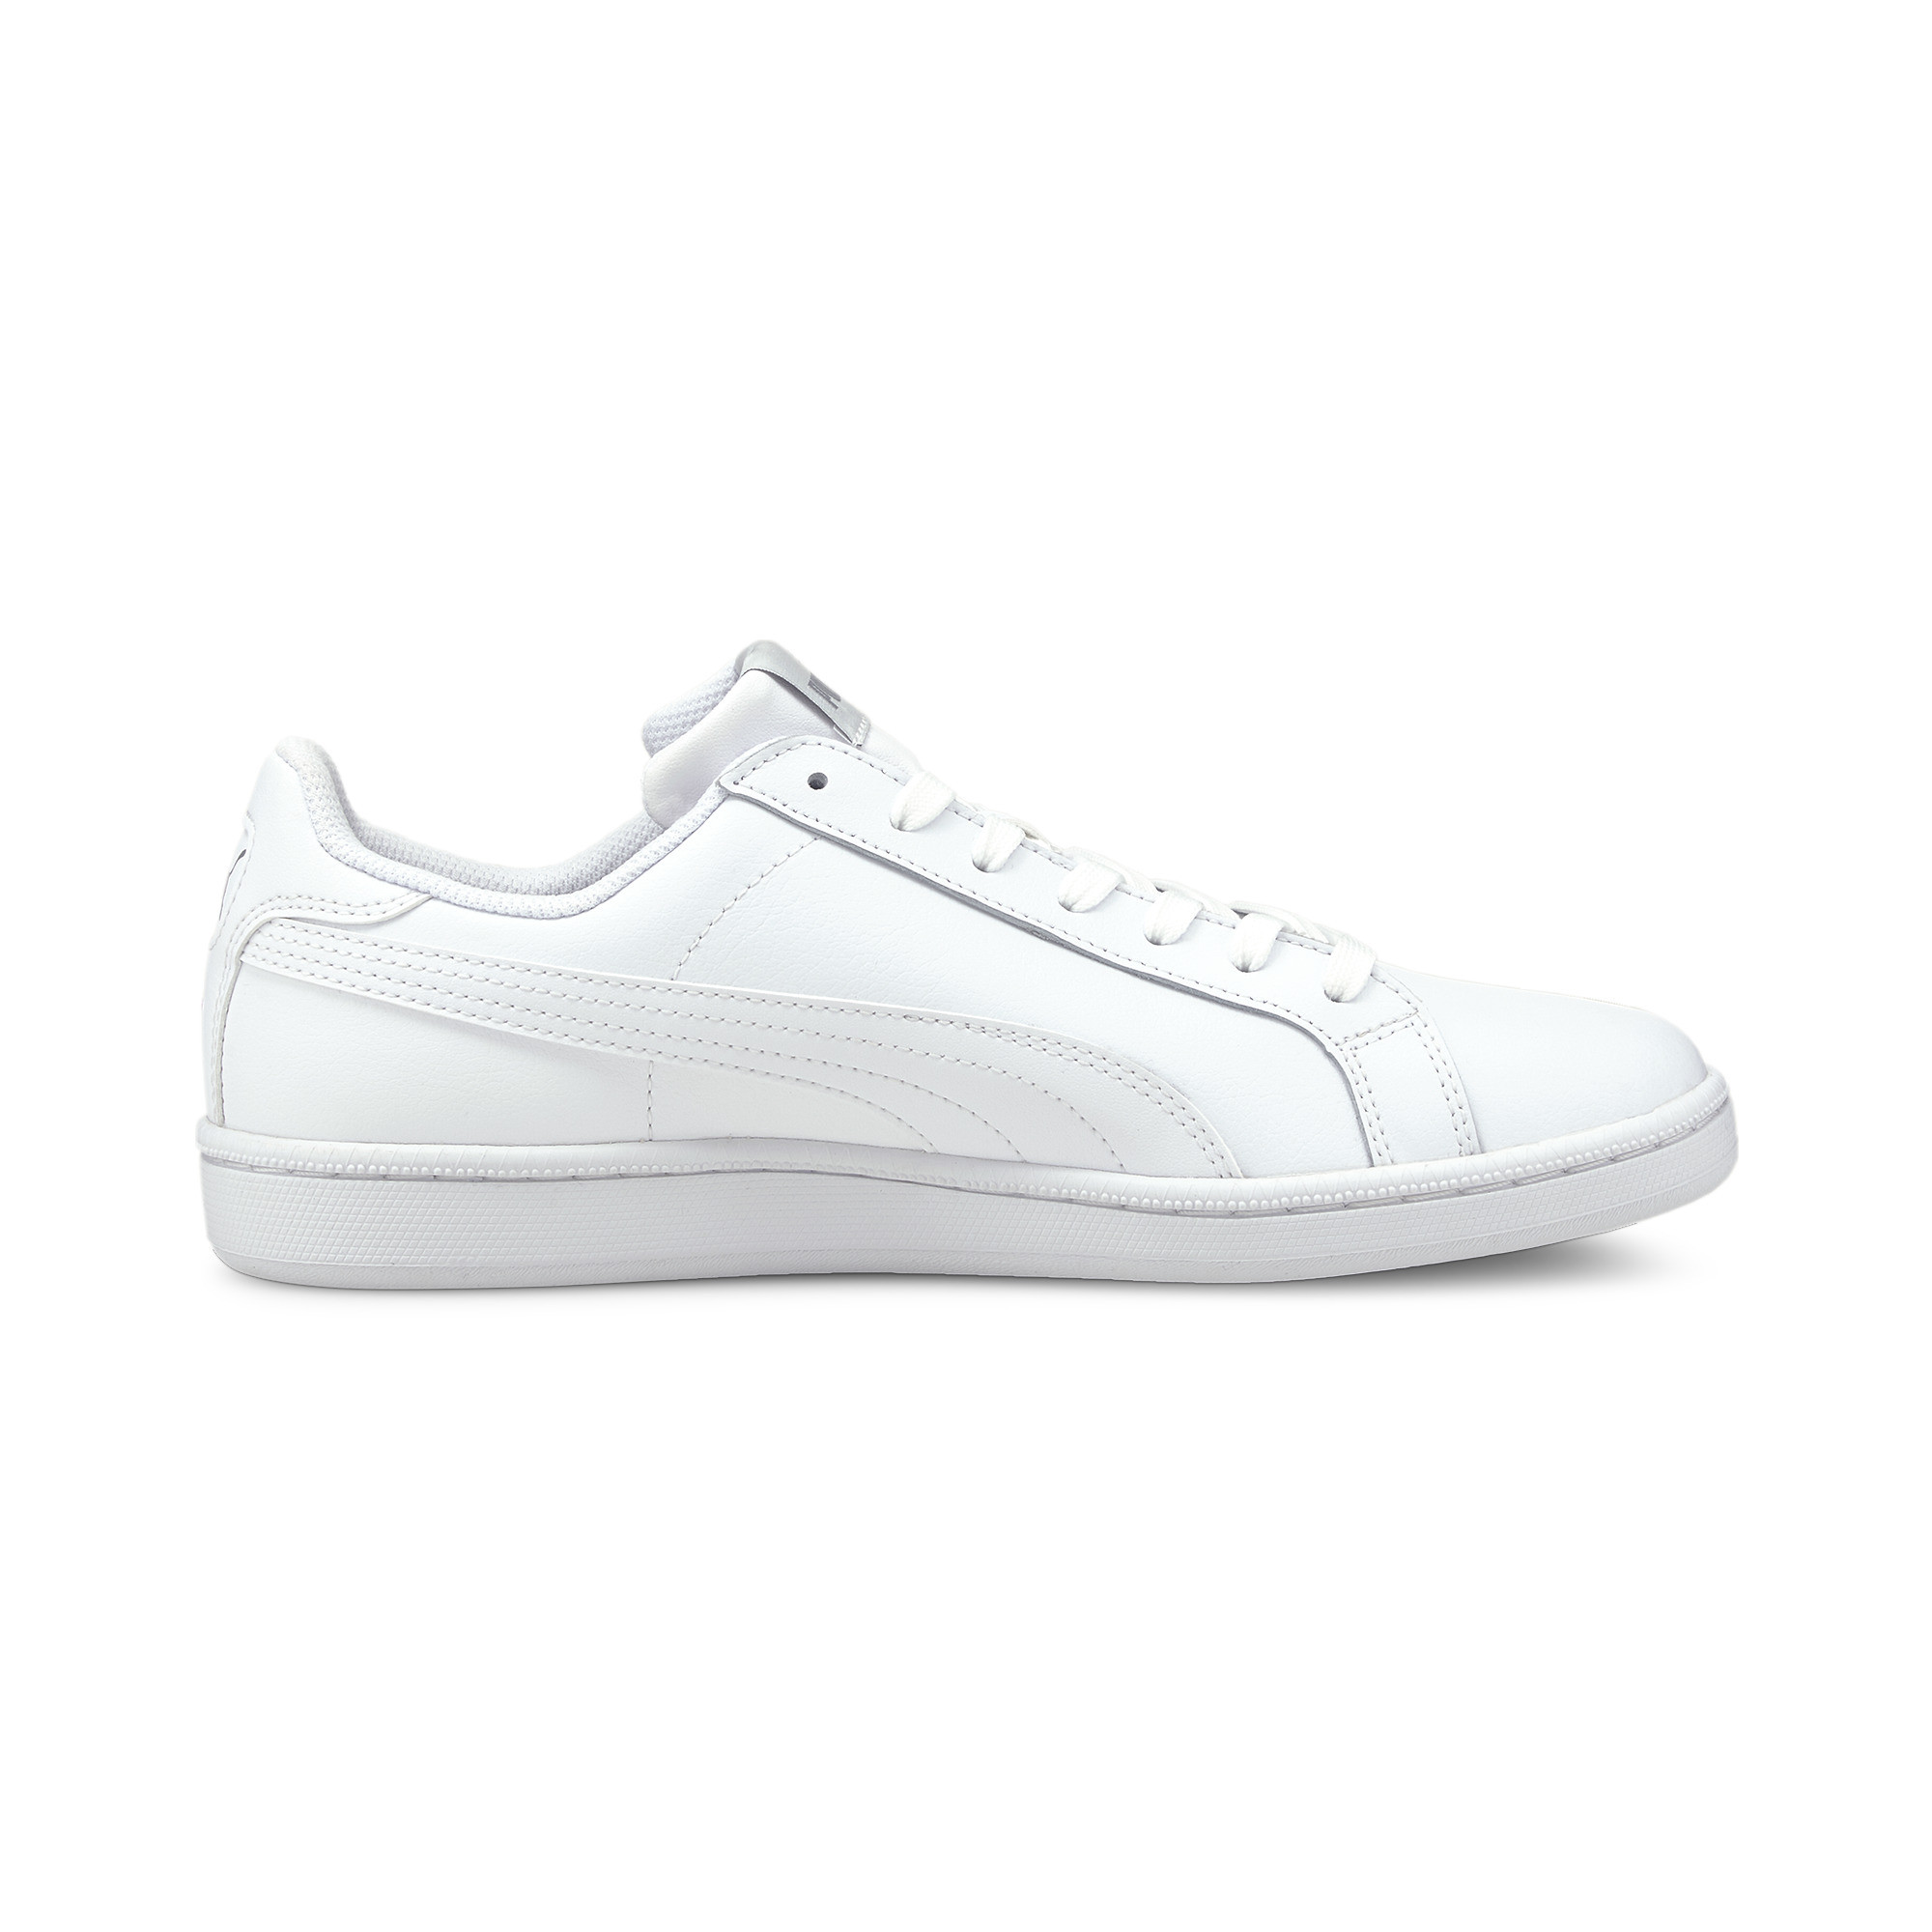 PUMA-Smash-Trainers-Schuhe-Sneakers-Sport-Classics-Unisex-Neu Indexbild 16